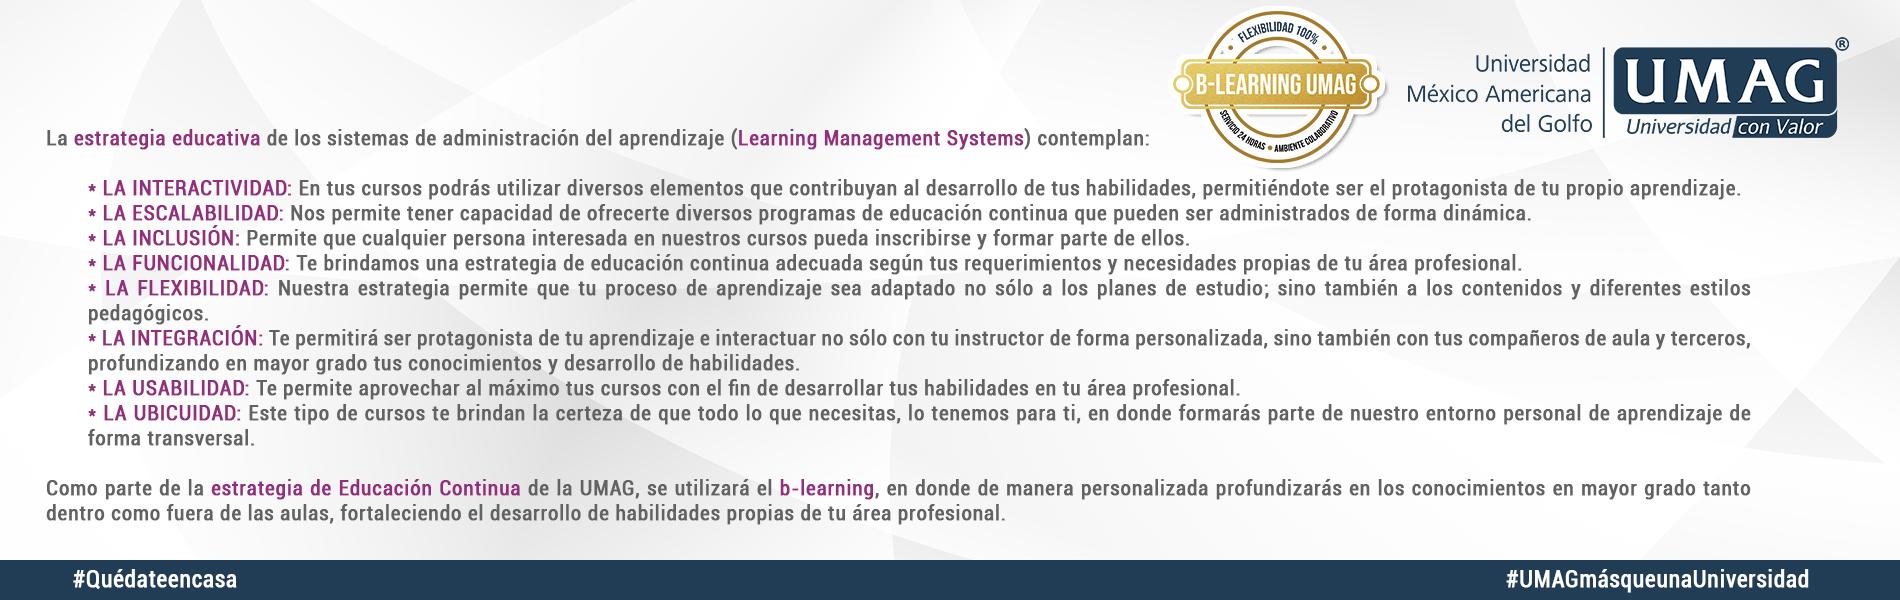 banner-b-learning